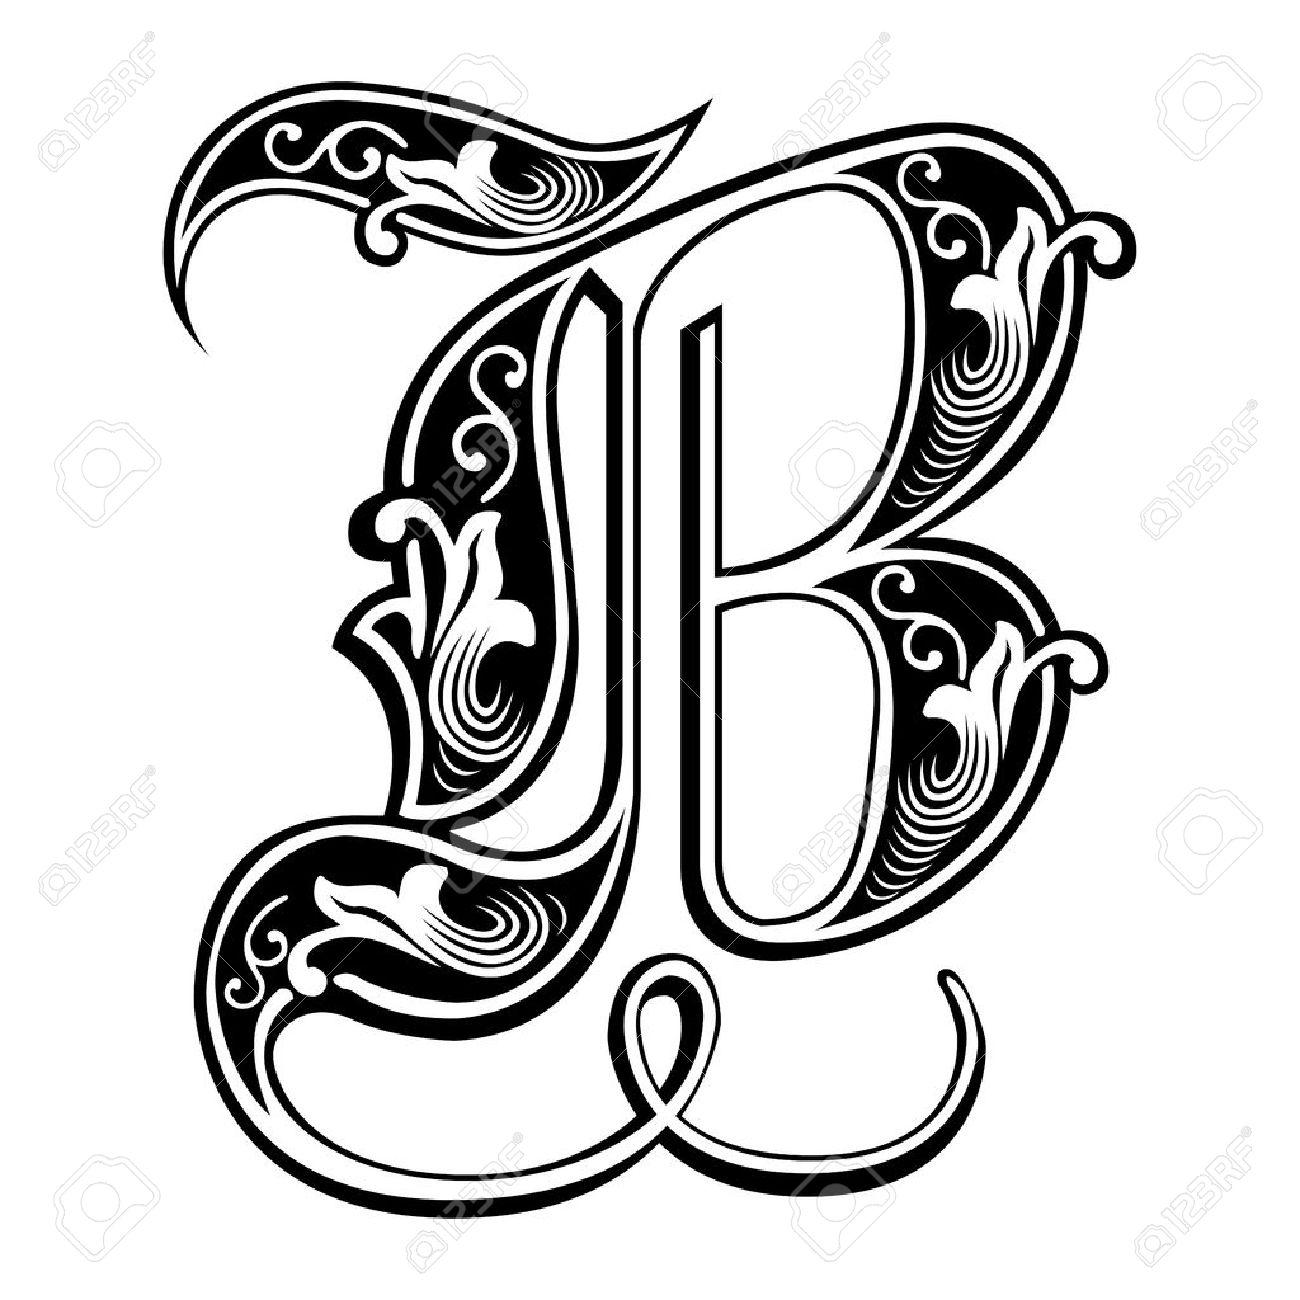 Beautiful decoration English alphabets, Gothic style, letter B - 27142593